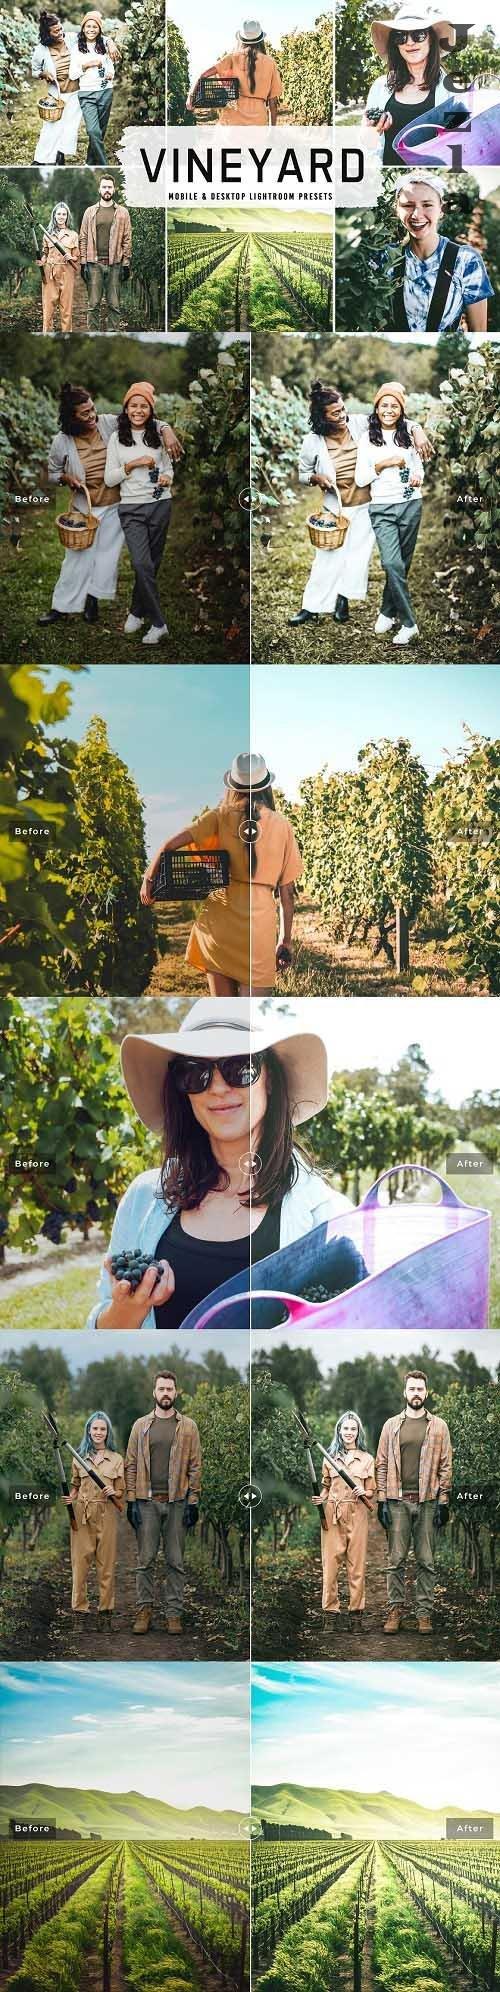 Vineyard Pro LRM Presets - 6525809